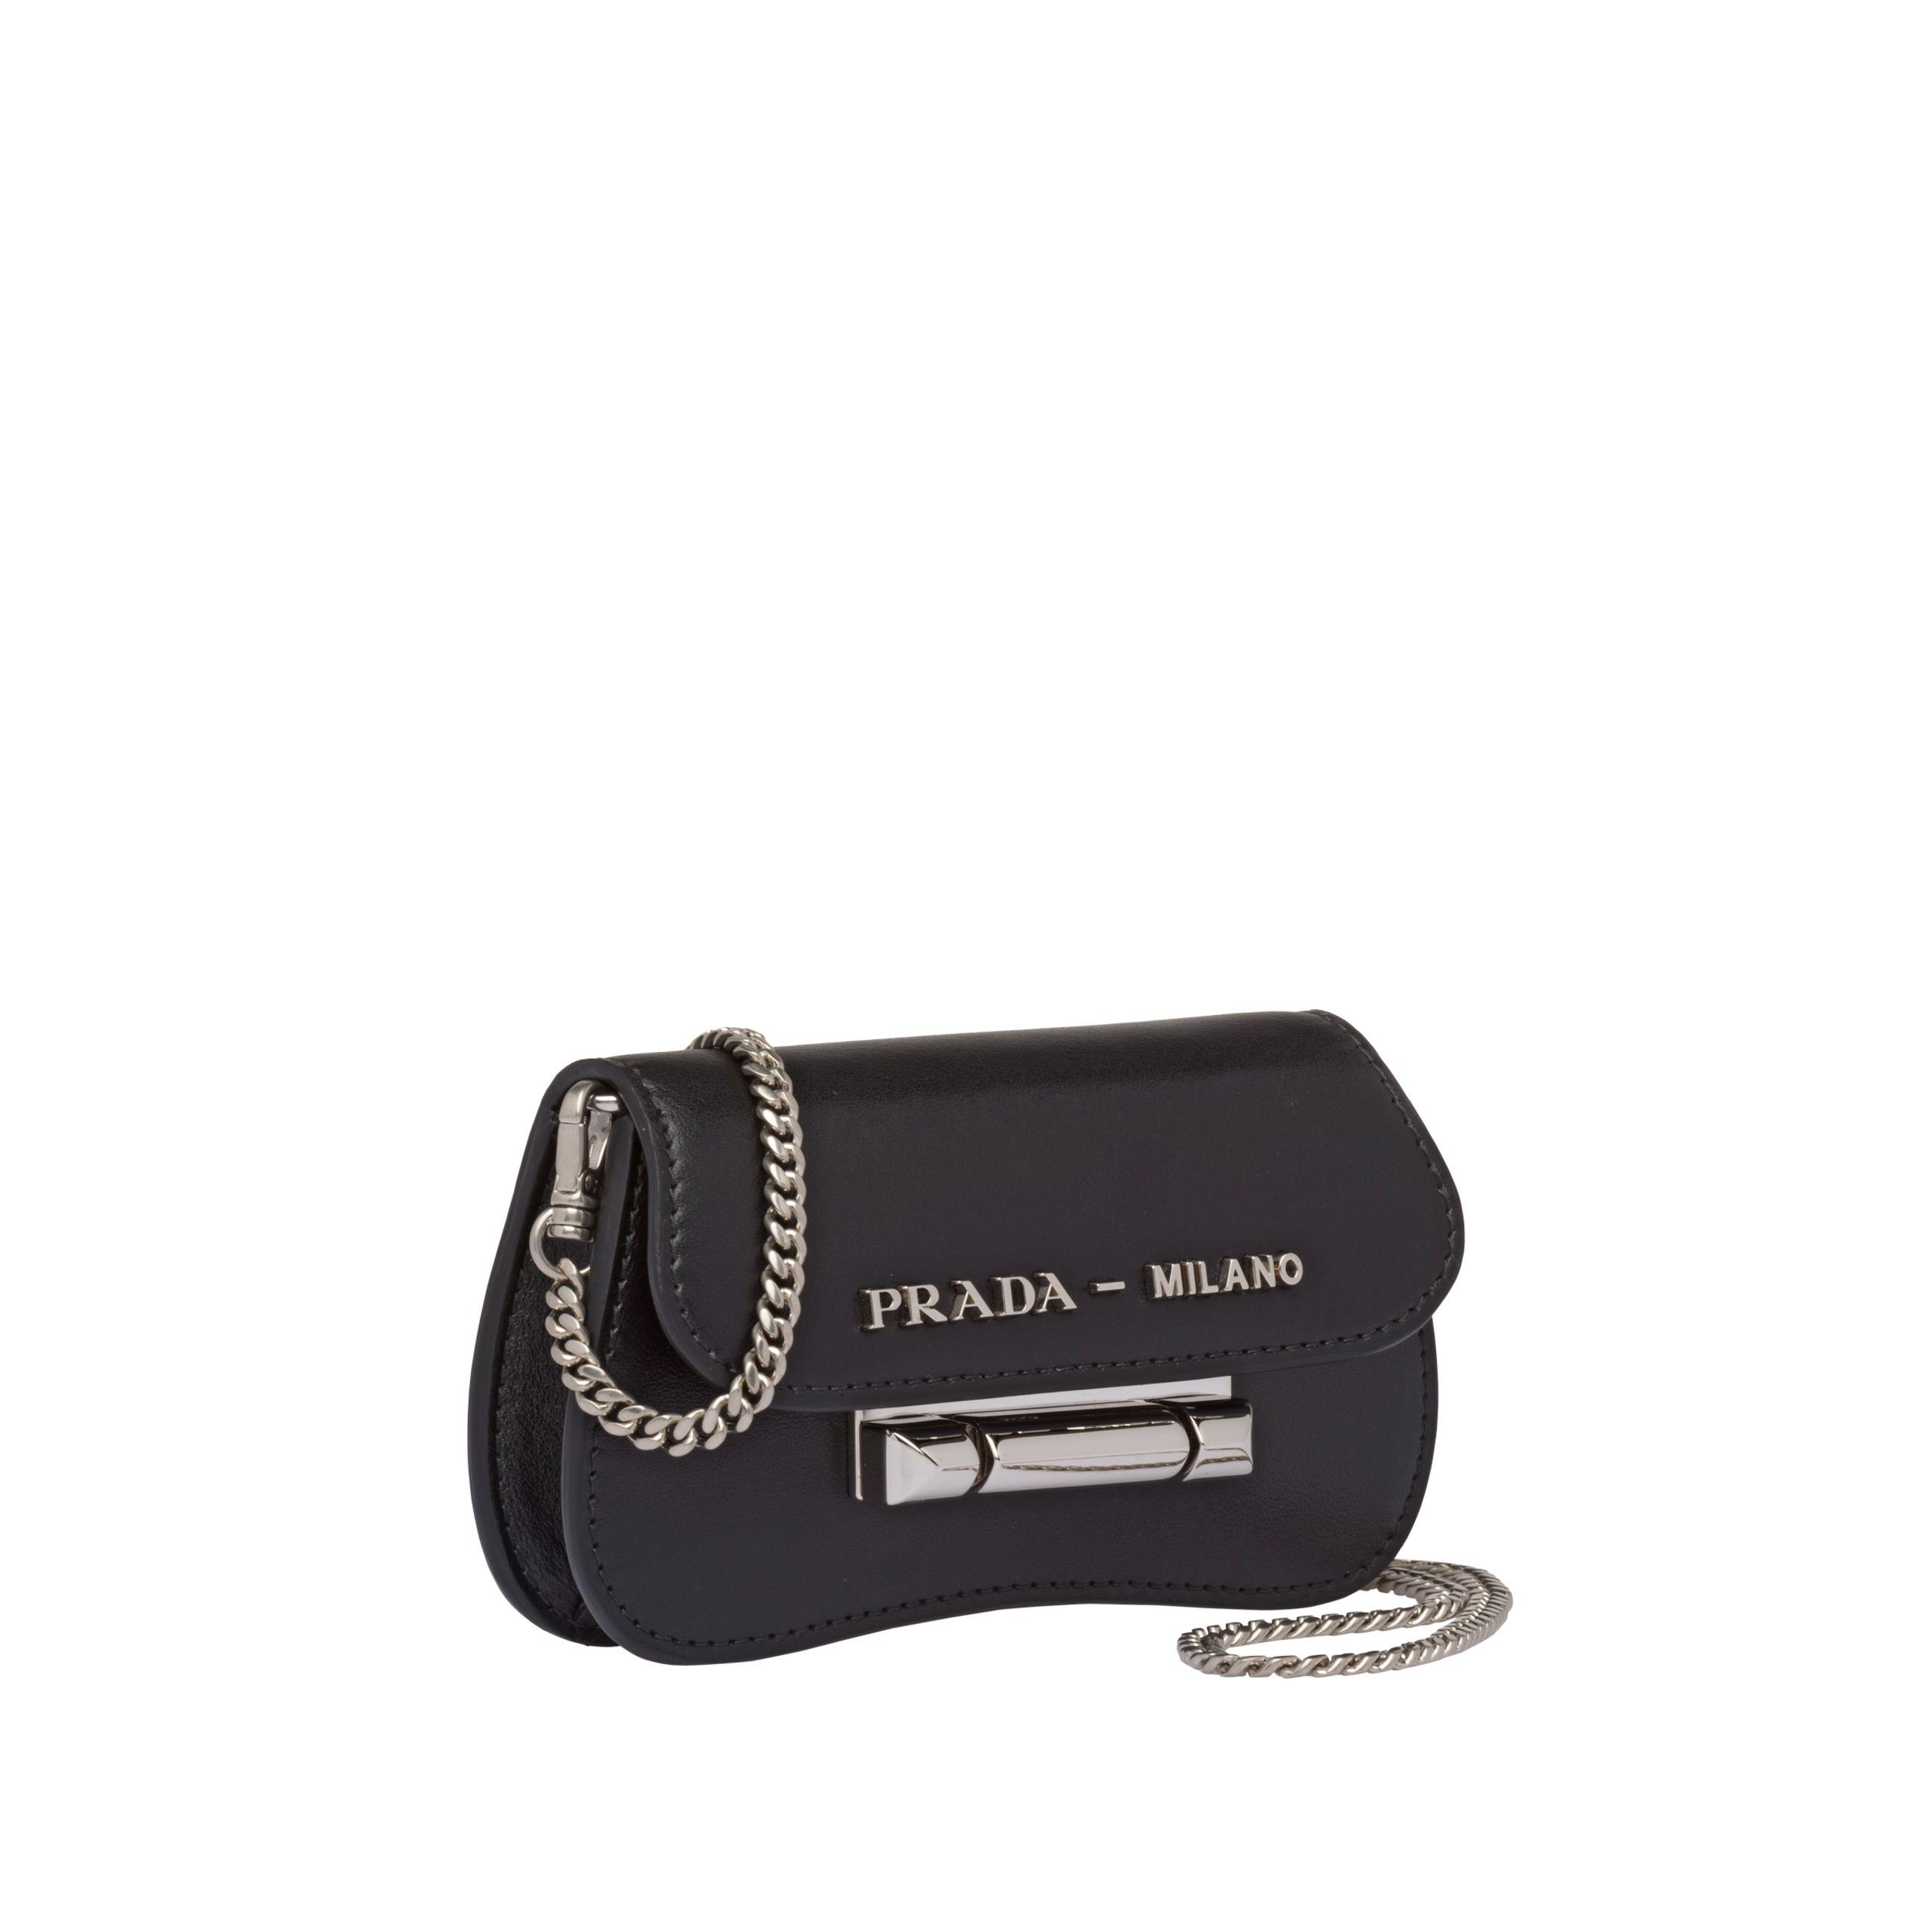 bd35816dce Prada Black Sybille Leather Mini-bag